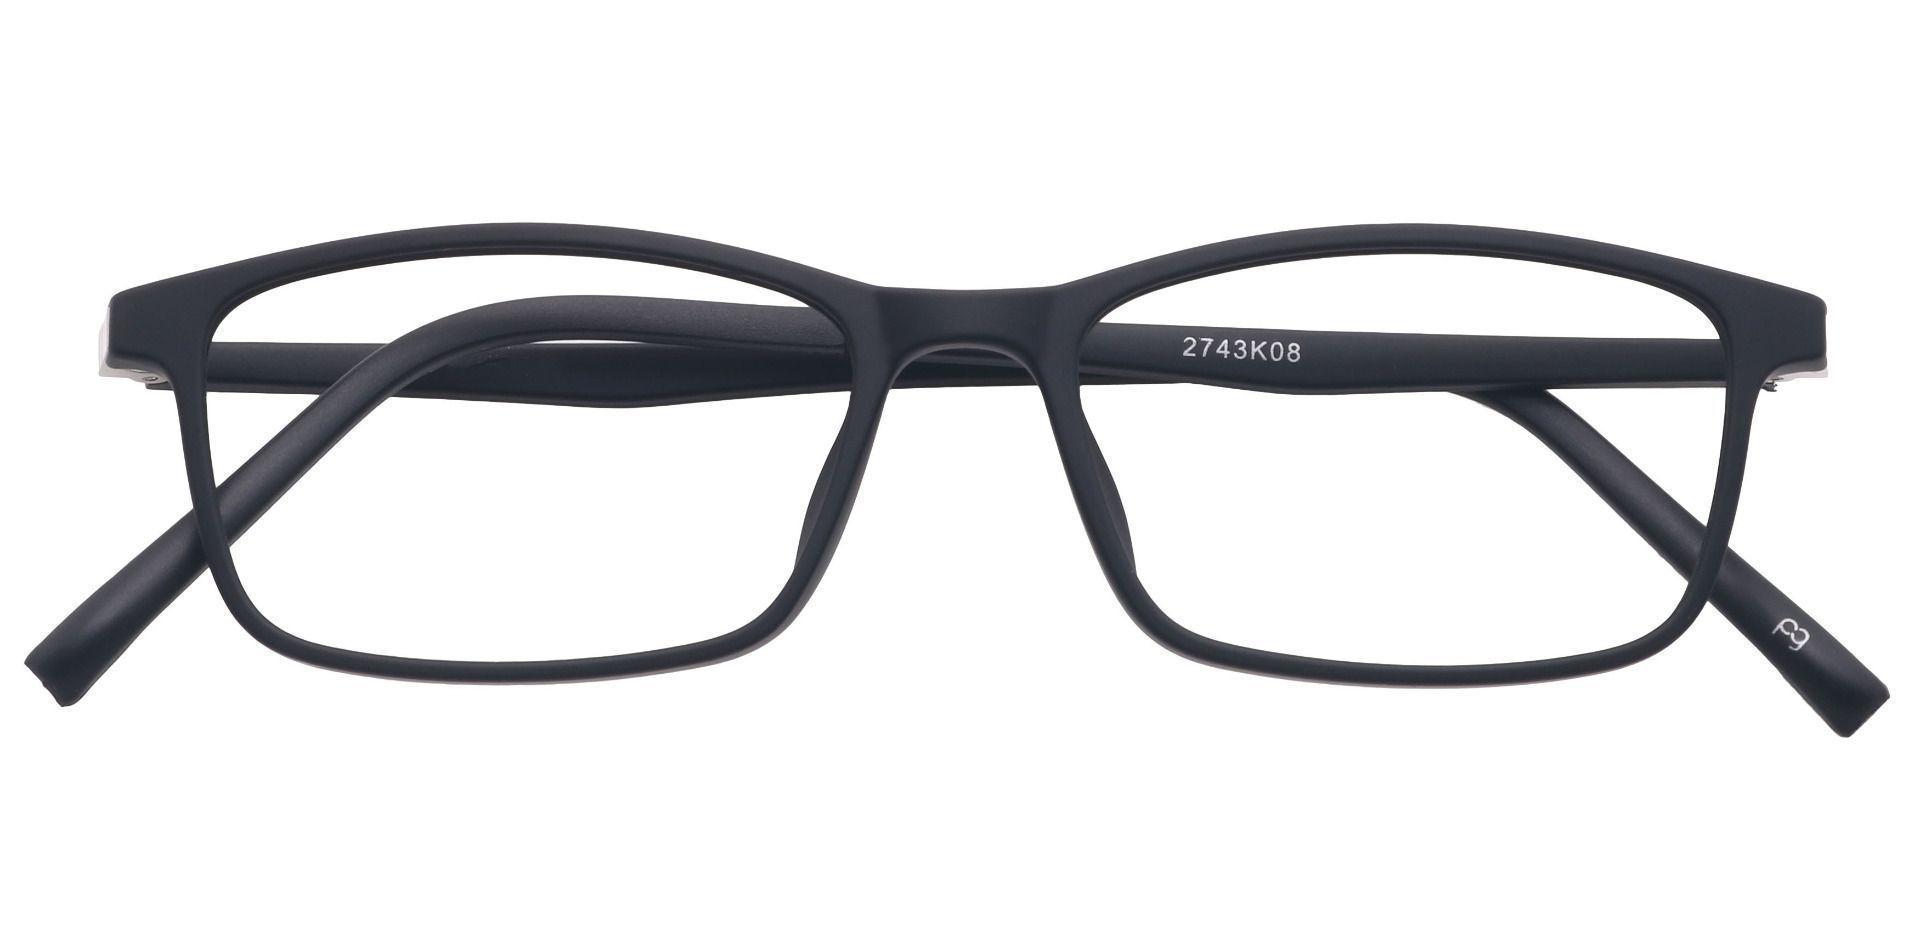 Ola Oval Prescription Glasses - Black